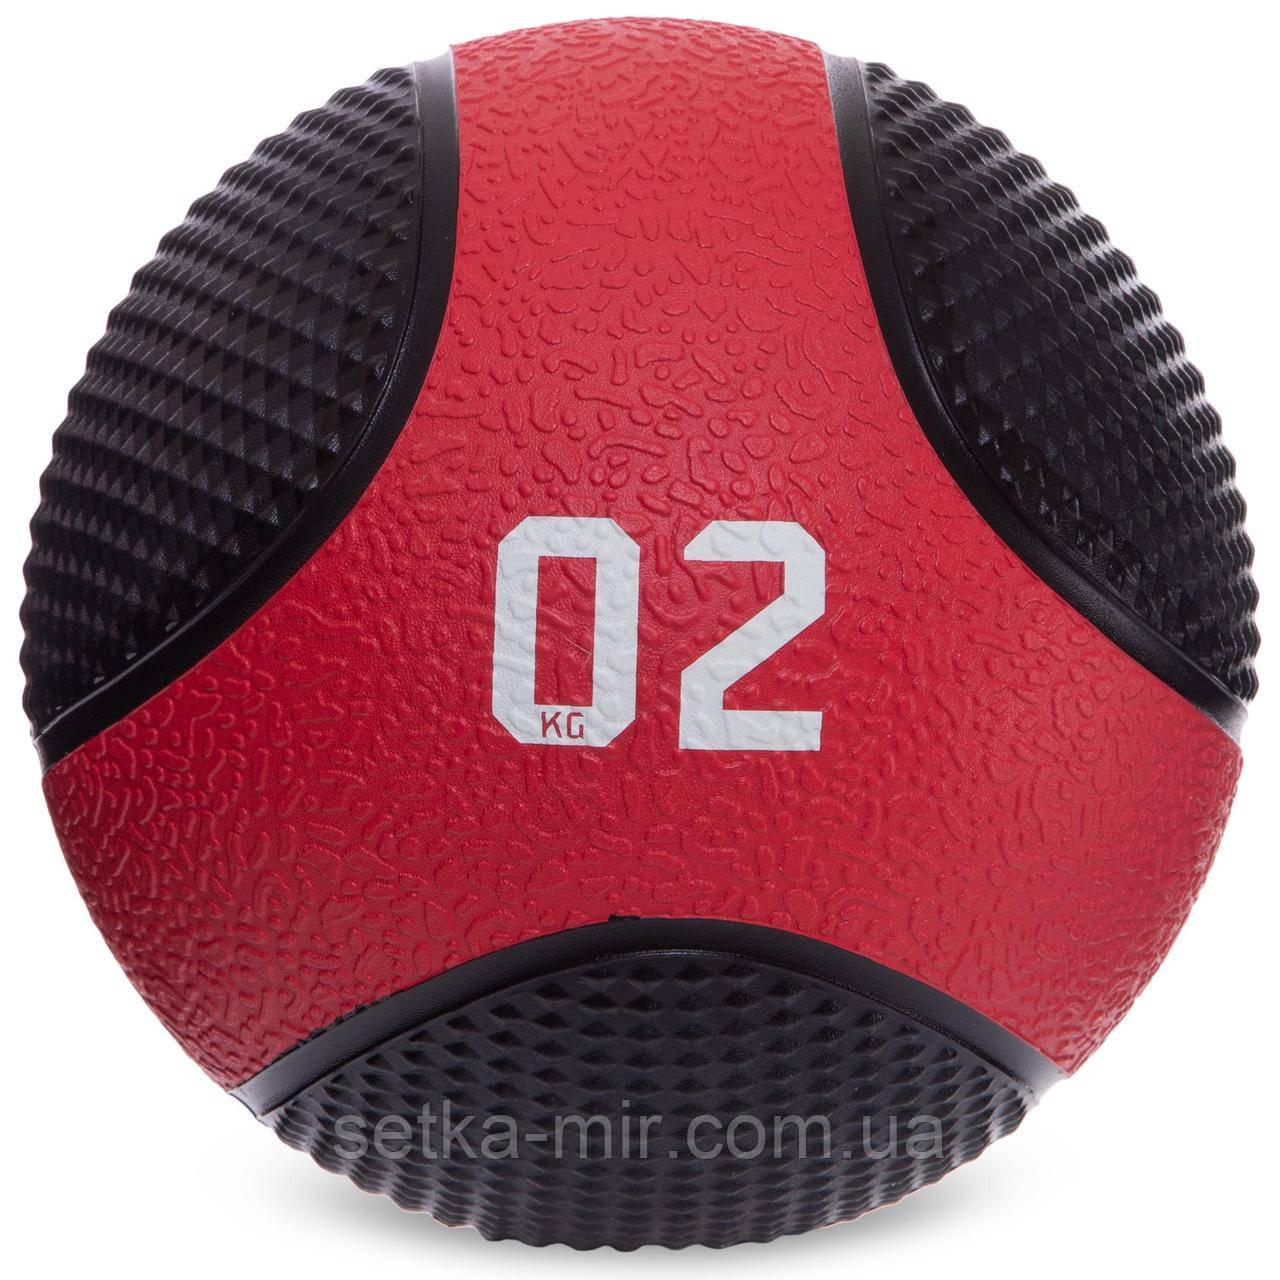 М'яч медичний медбол Medicine Ball FI-2824-2 2 кг